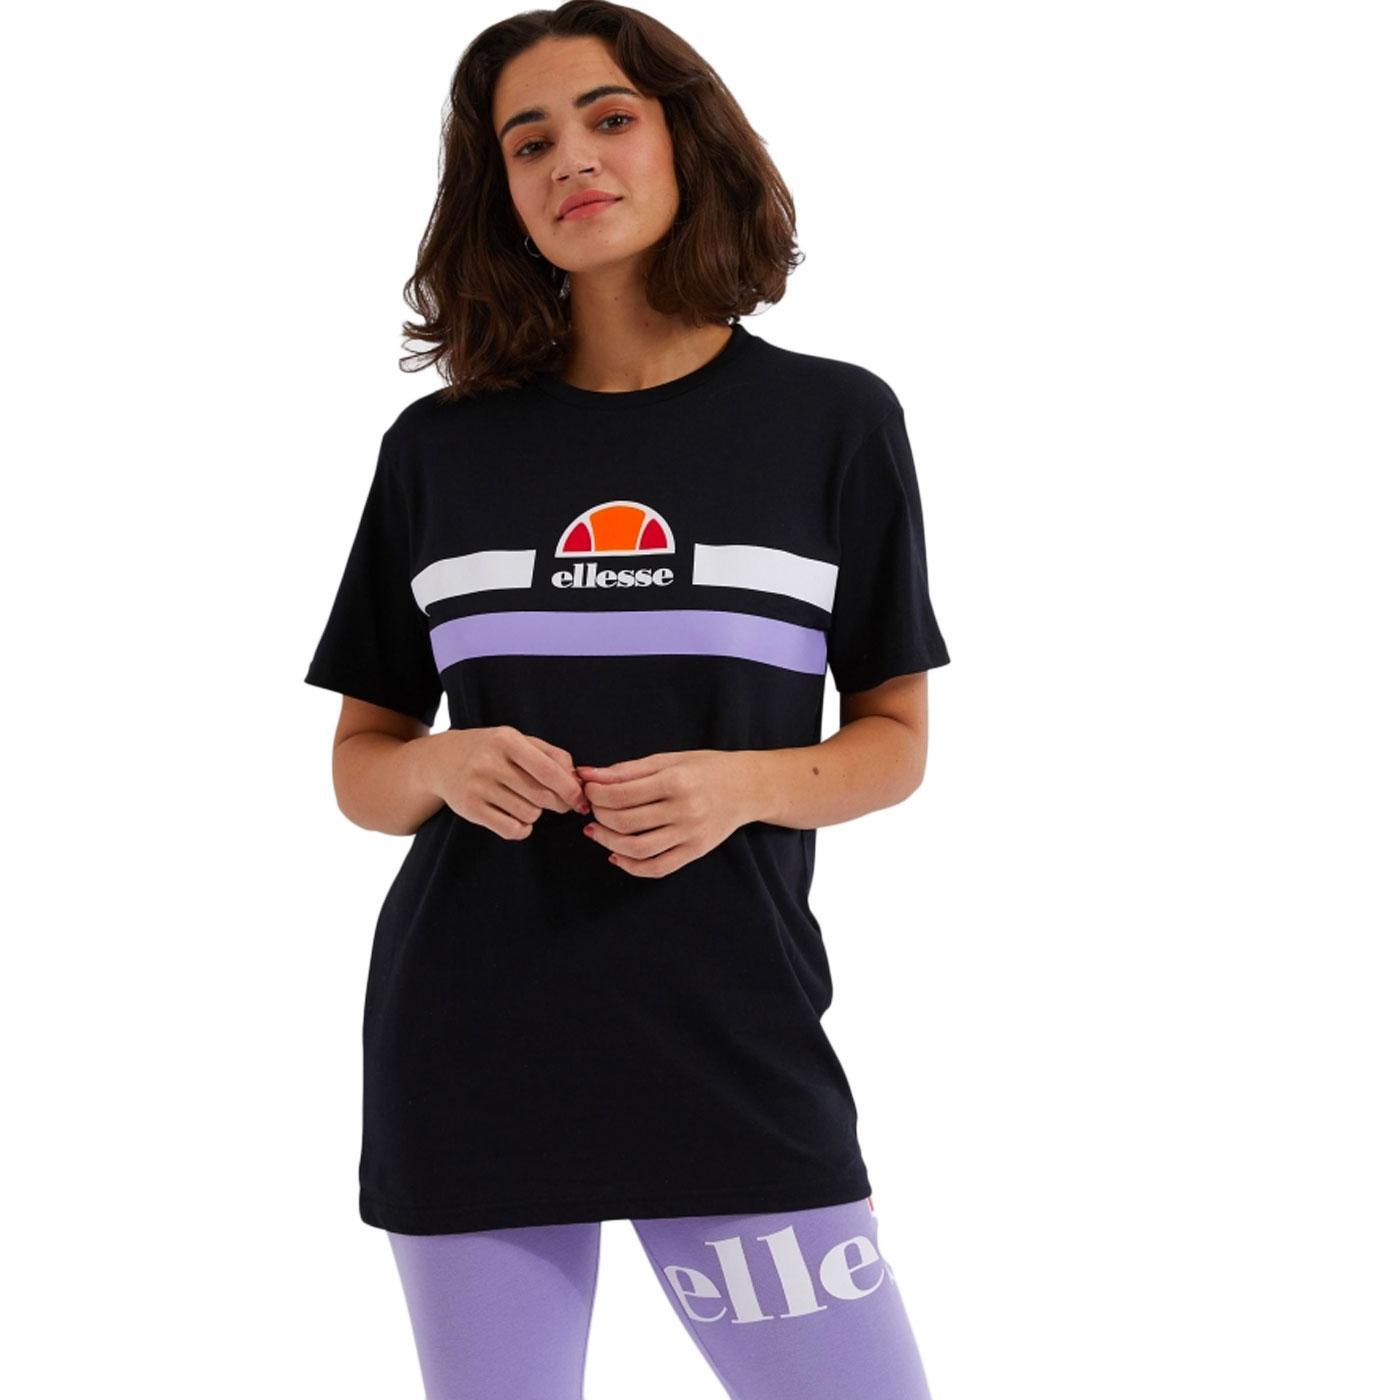 Lattea ELLESSE Women's Retro 80s Logo Stripe Tee B